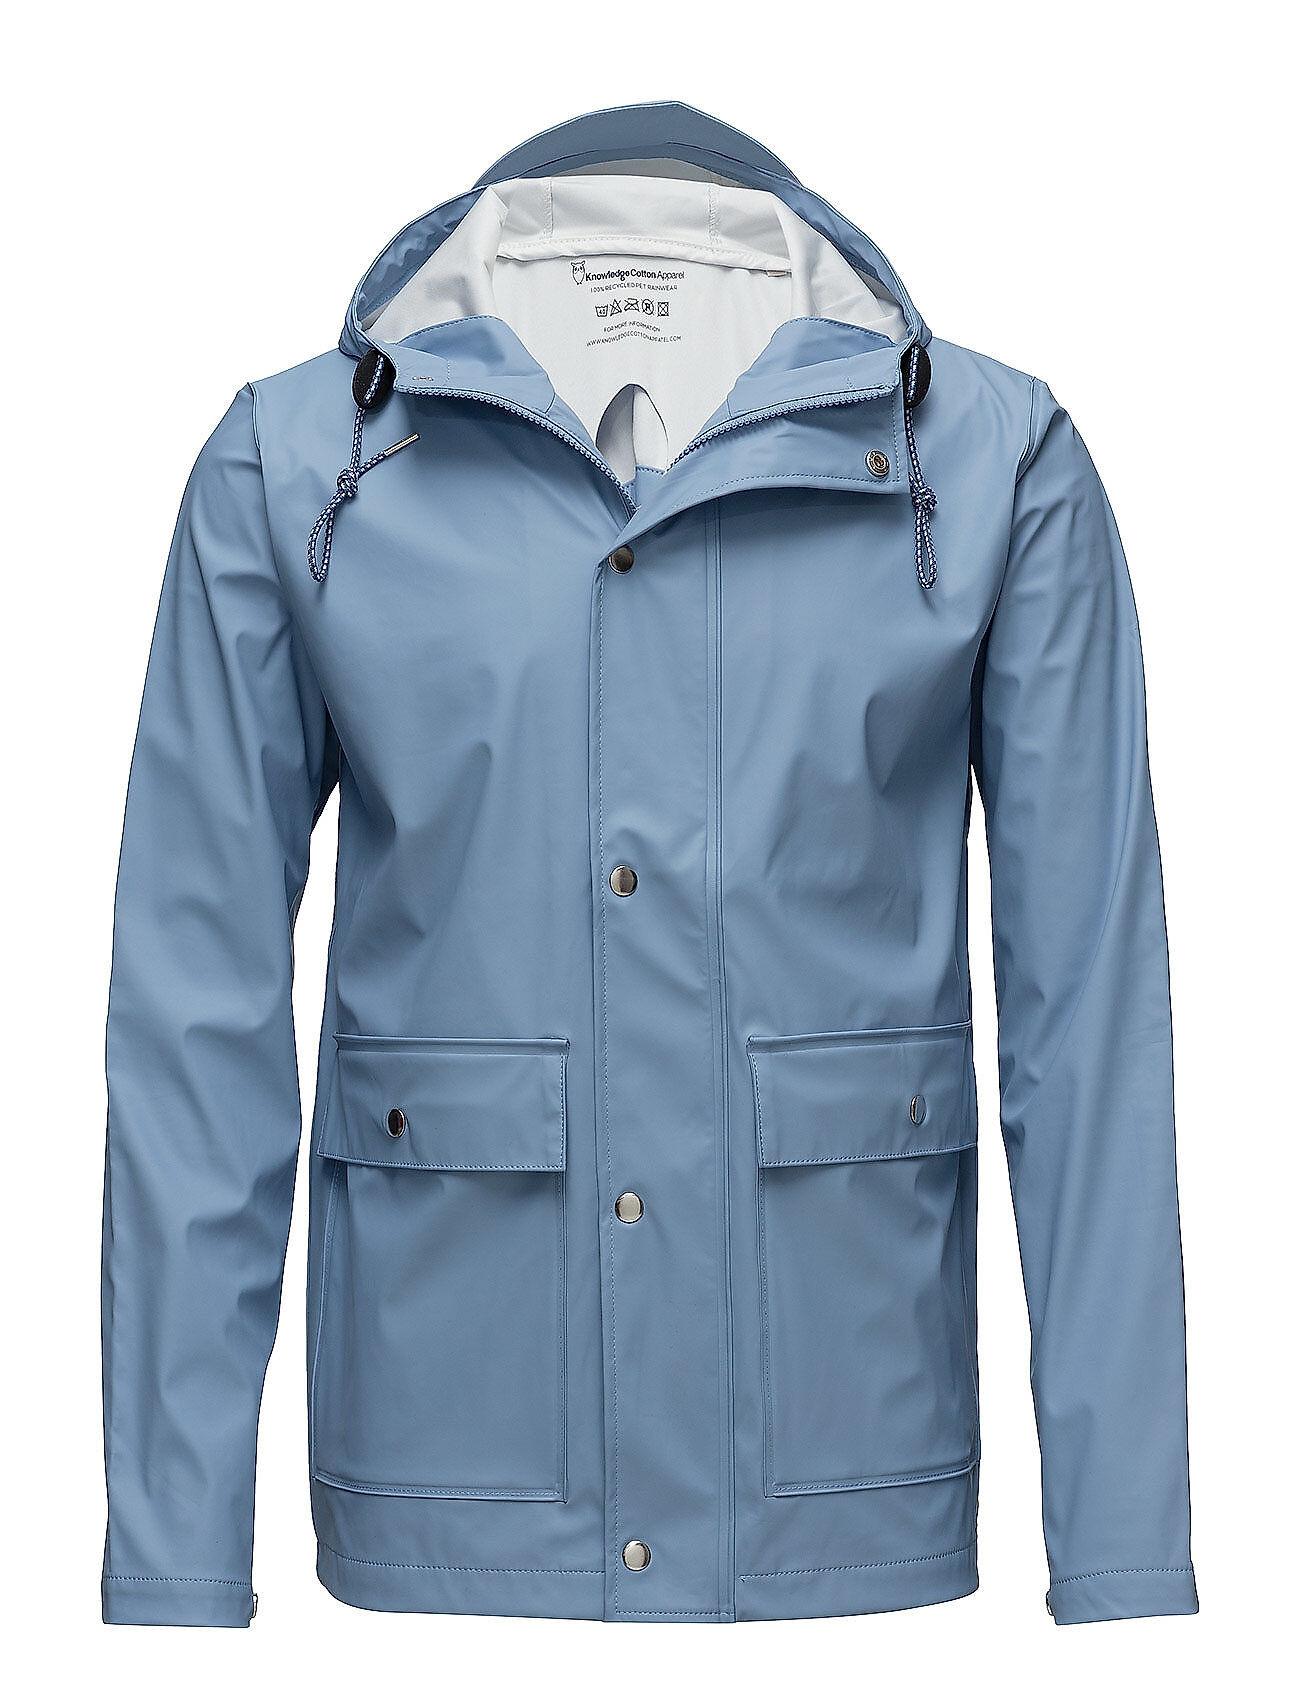 Knowledge Cotton Apparel Rain Jacket/Vegan